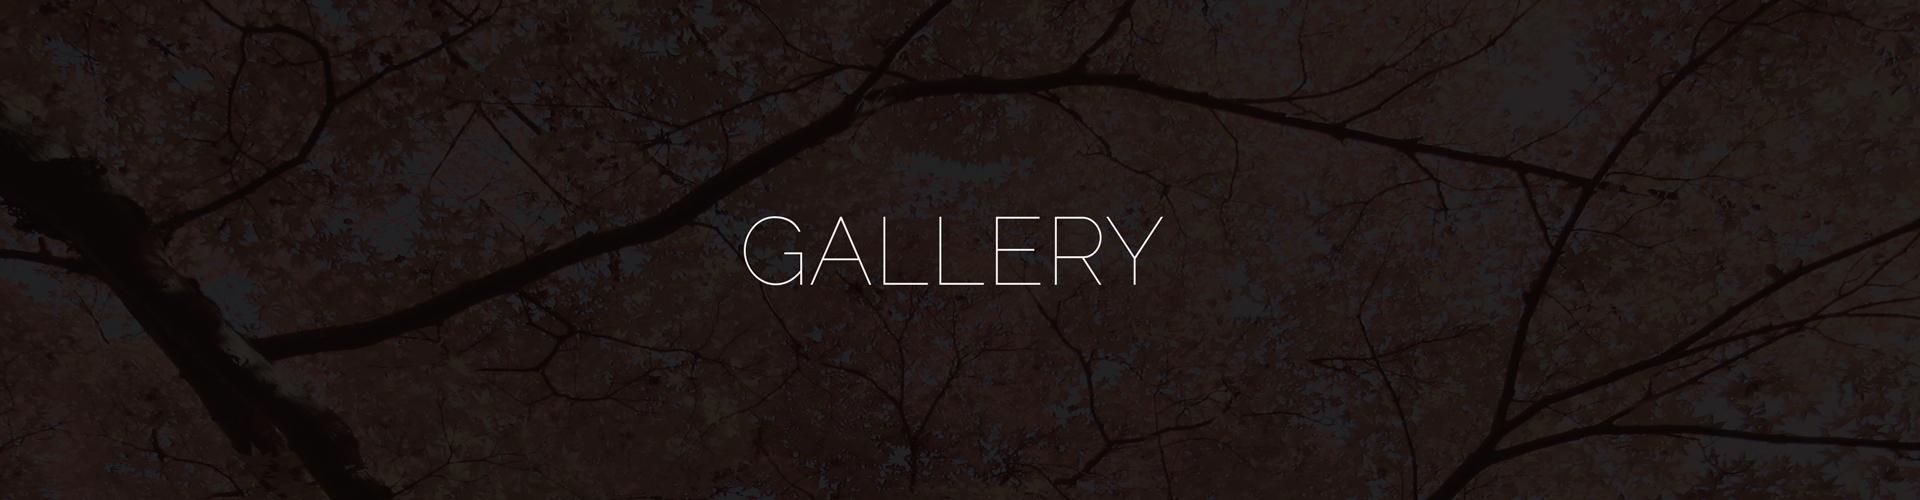 gallery-B.jpg